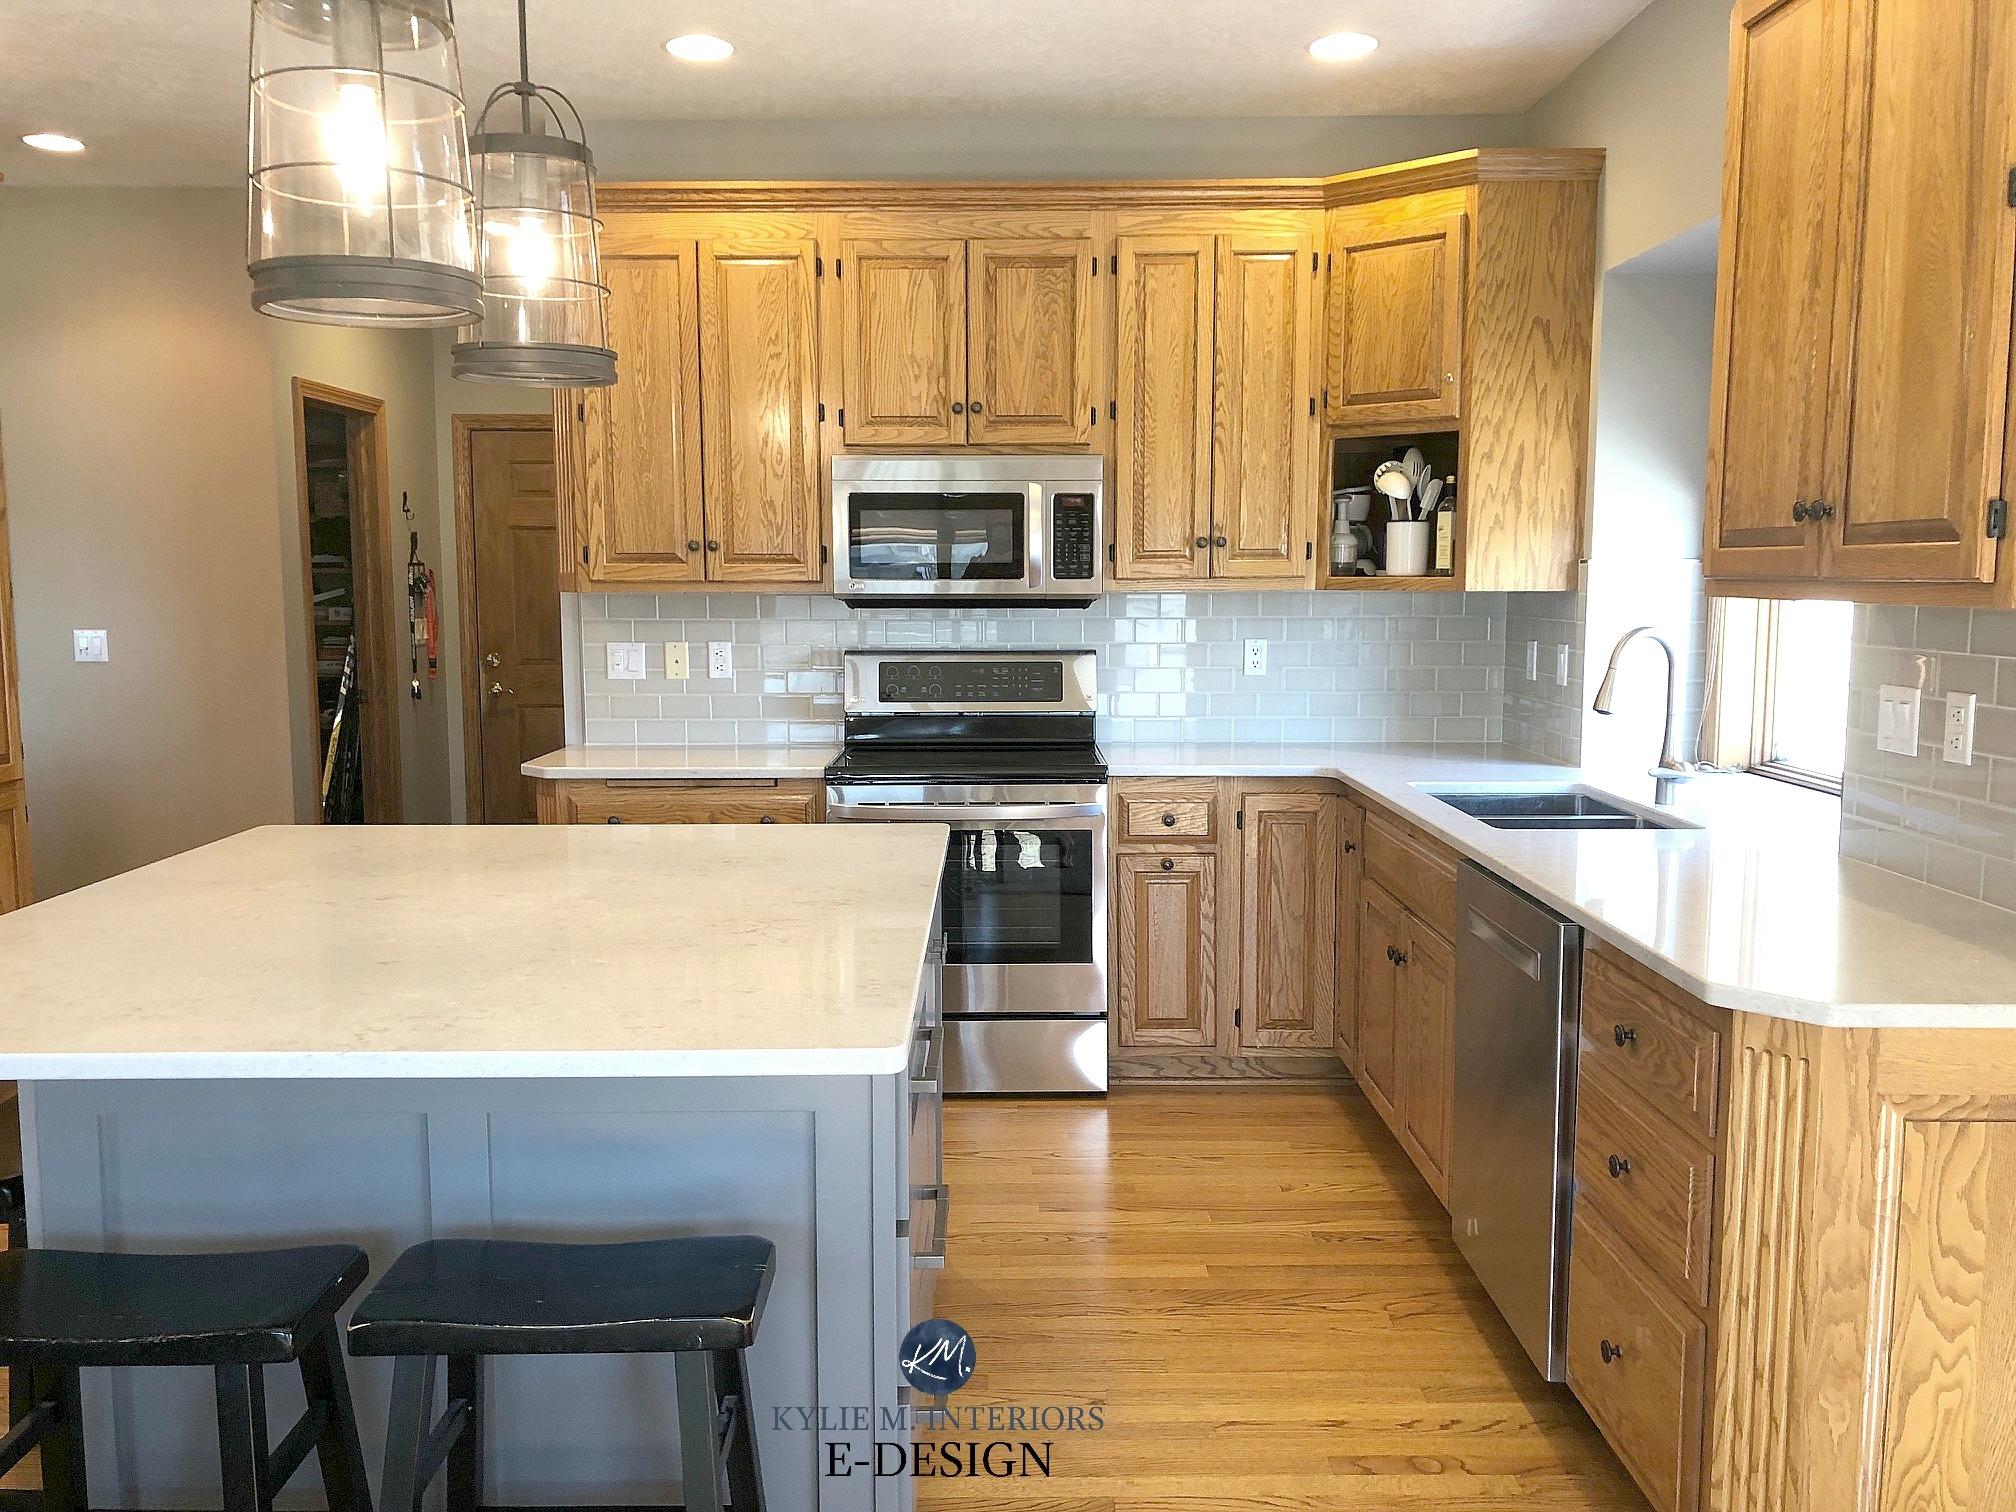 8 Images White Quartz Countertops With Honey Oak Cabinets ...